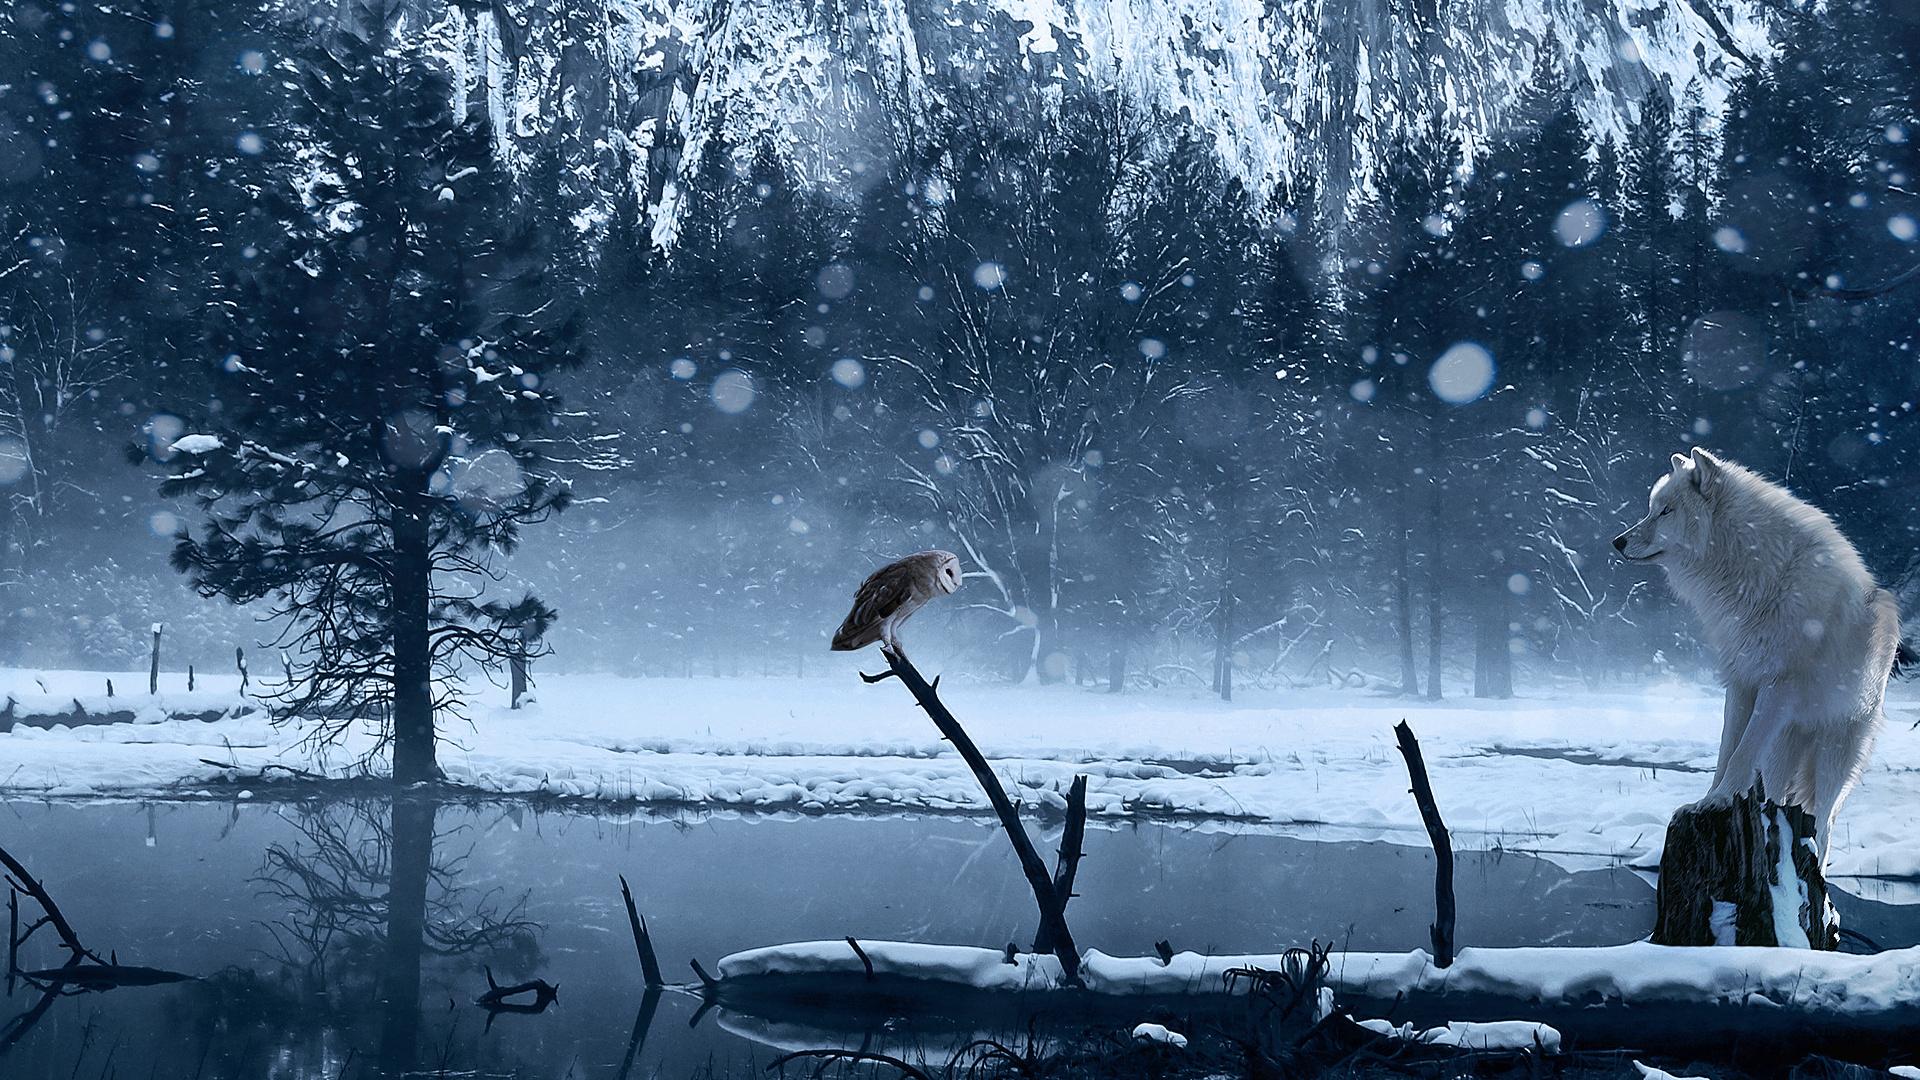 winter interlude - Desktop Wallpaper